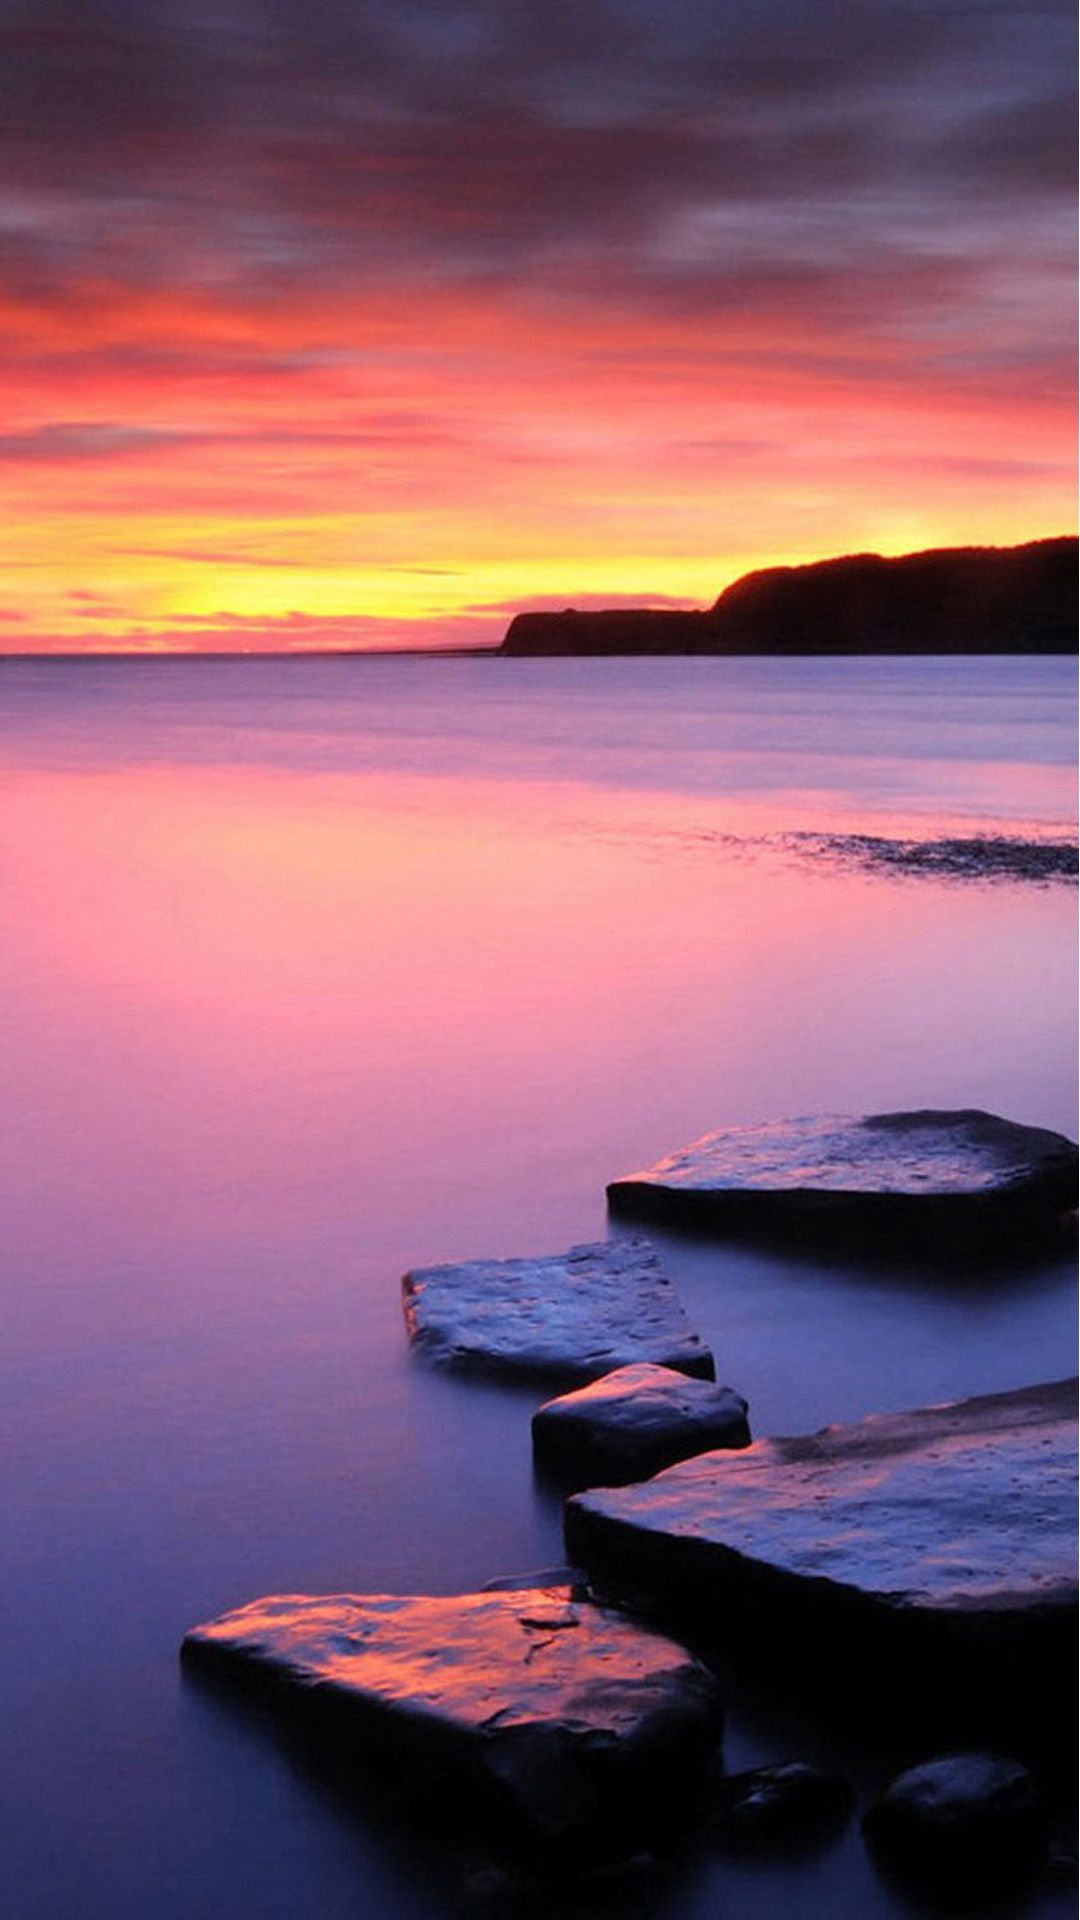 Nature Pure Calm Lake Landscape Iphone 6 Plus Wallpaper Iphone Wallpaper Landscape Sunset Landscape Sunset Wallpaper